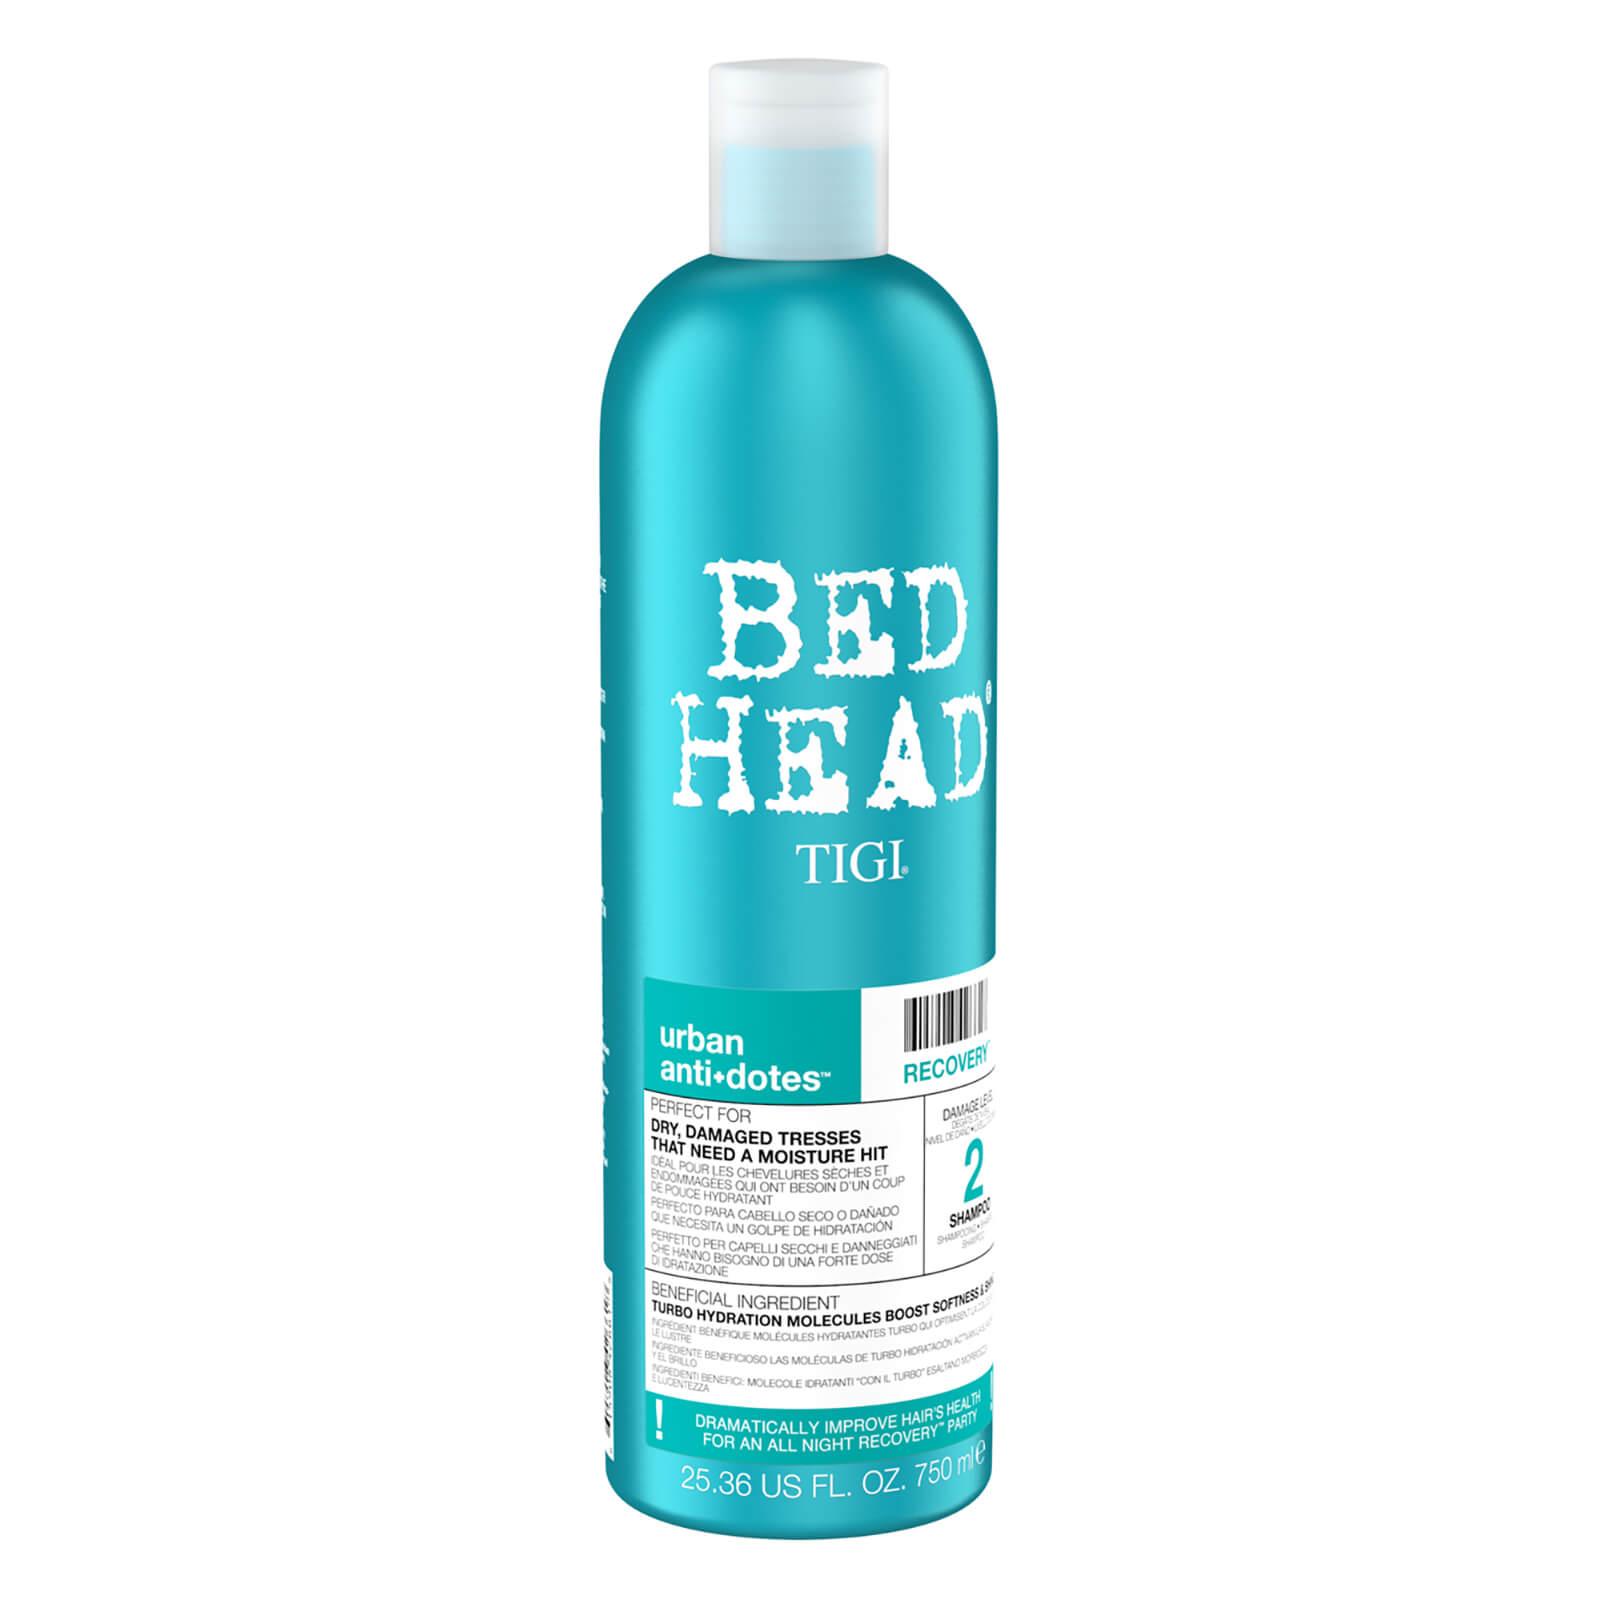 Tigi Bed Head Urban Antidotes Recovery Moisturising Shampoo for Dry and Damaged Hair 750ml